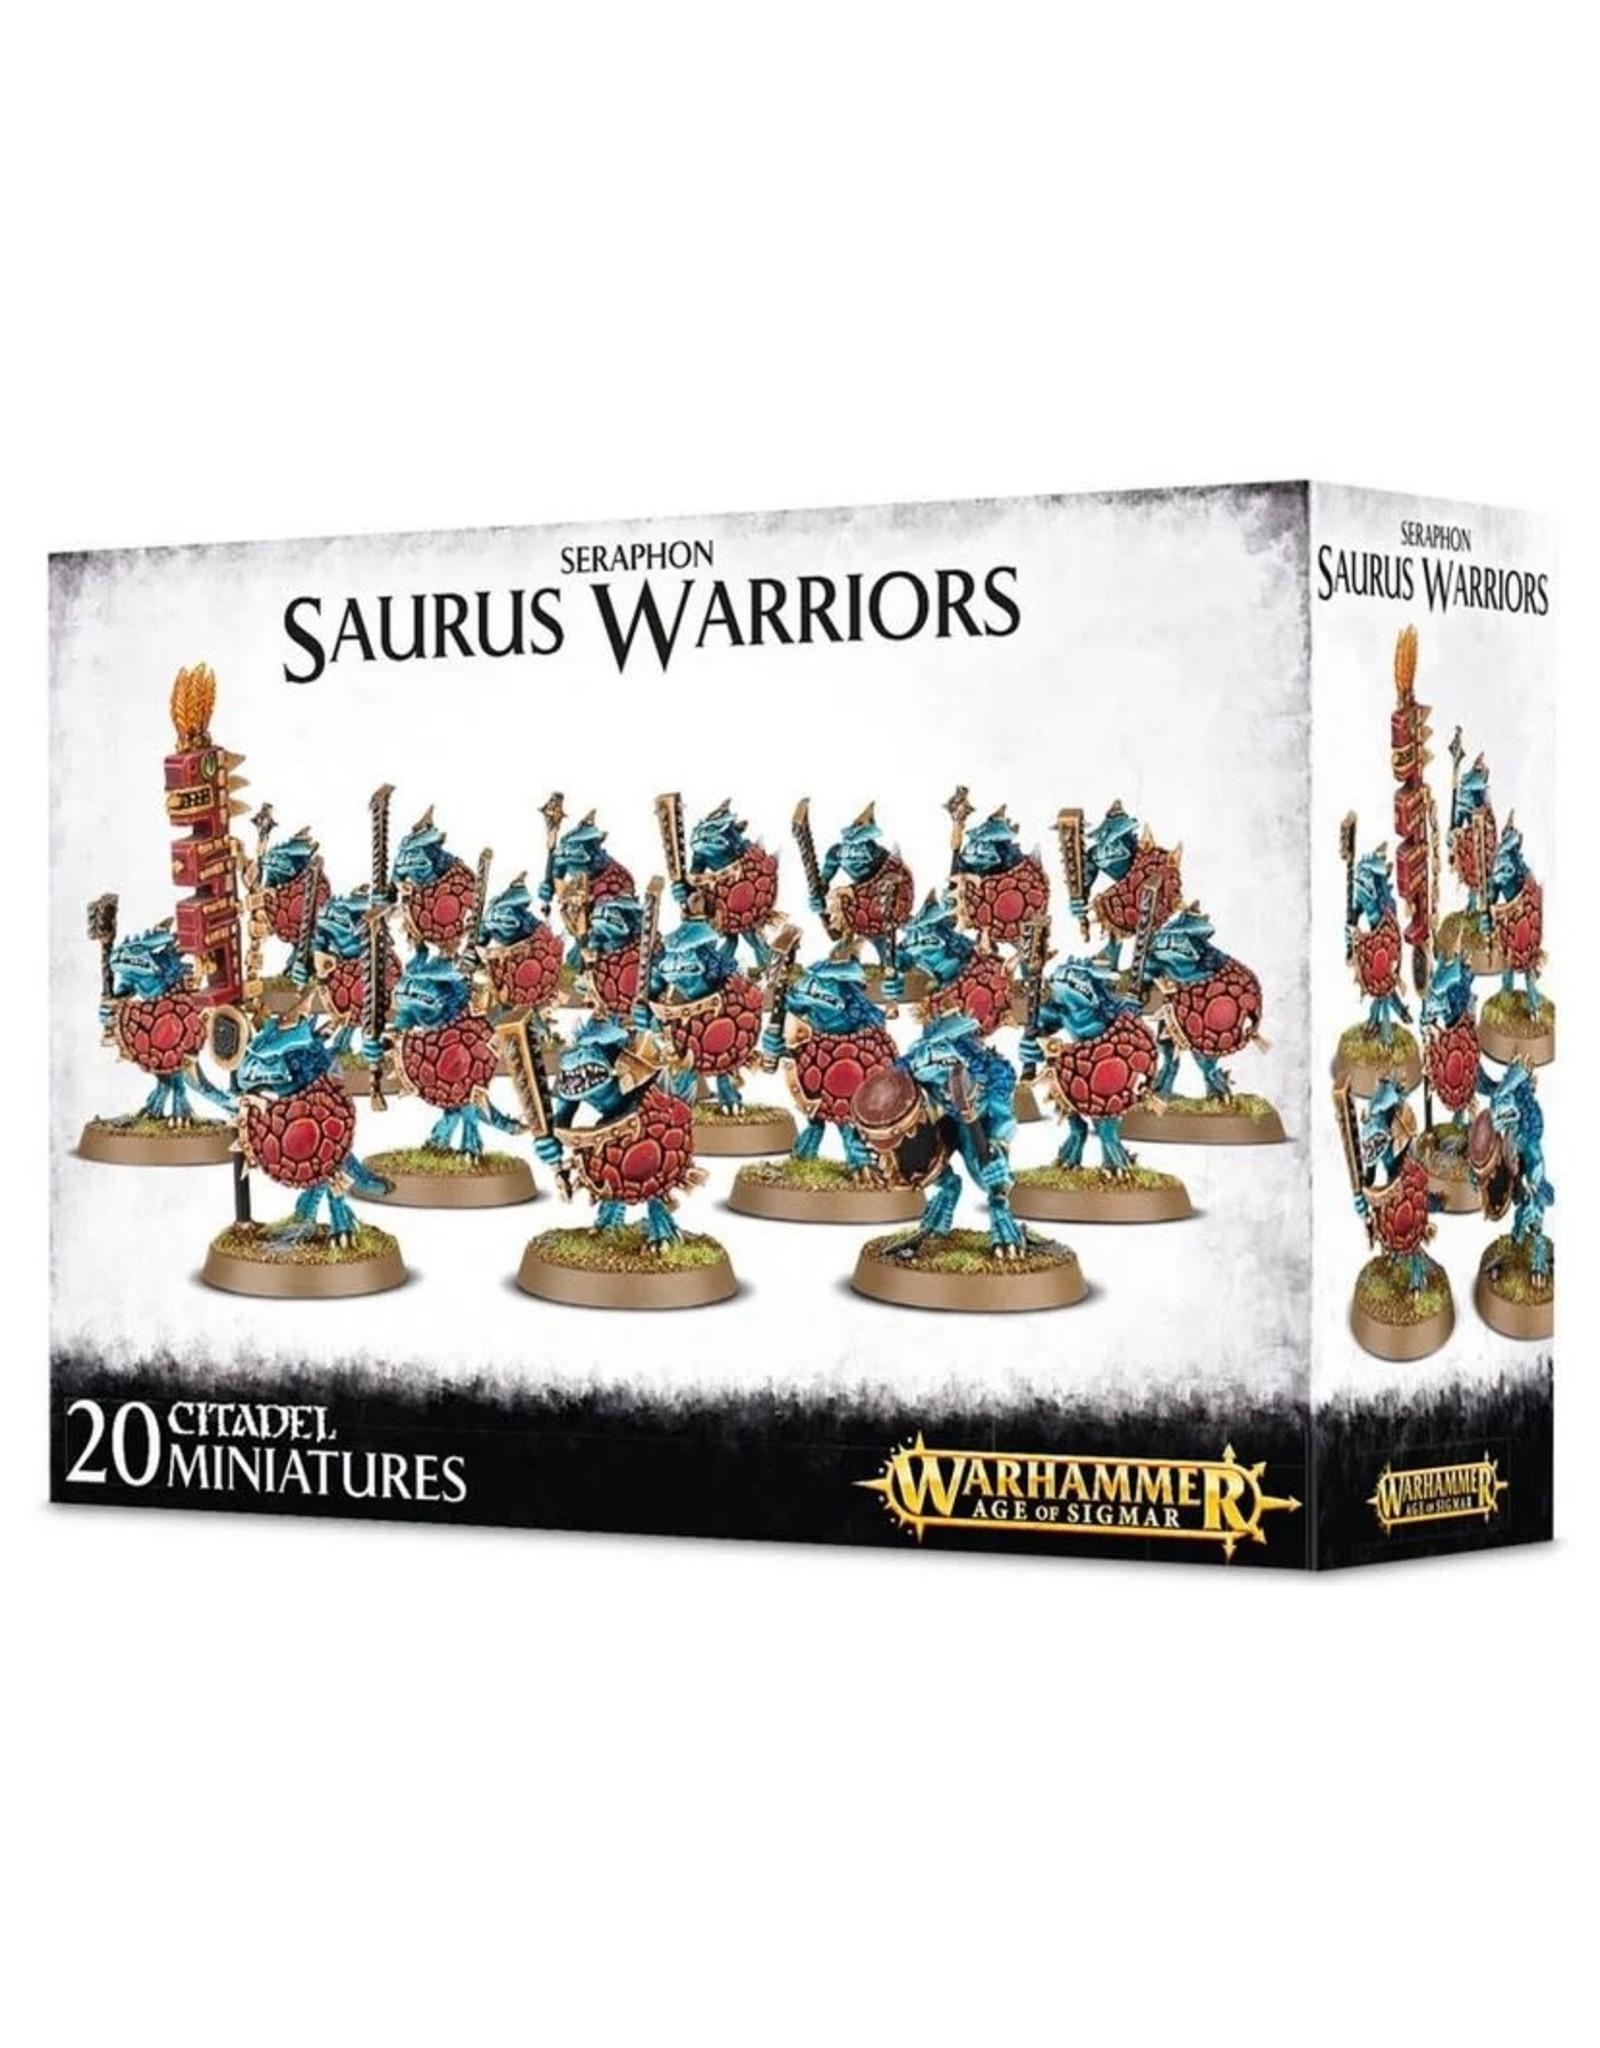 Warhammer AoS WHAoS Seraphon Saurus Warriors